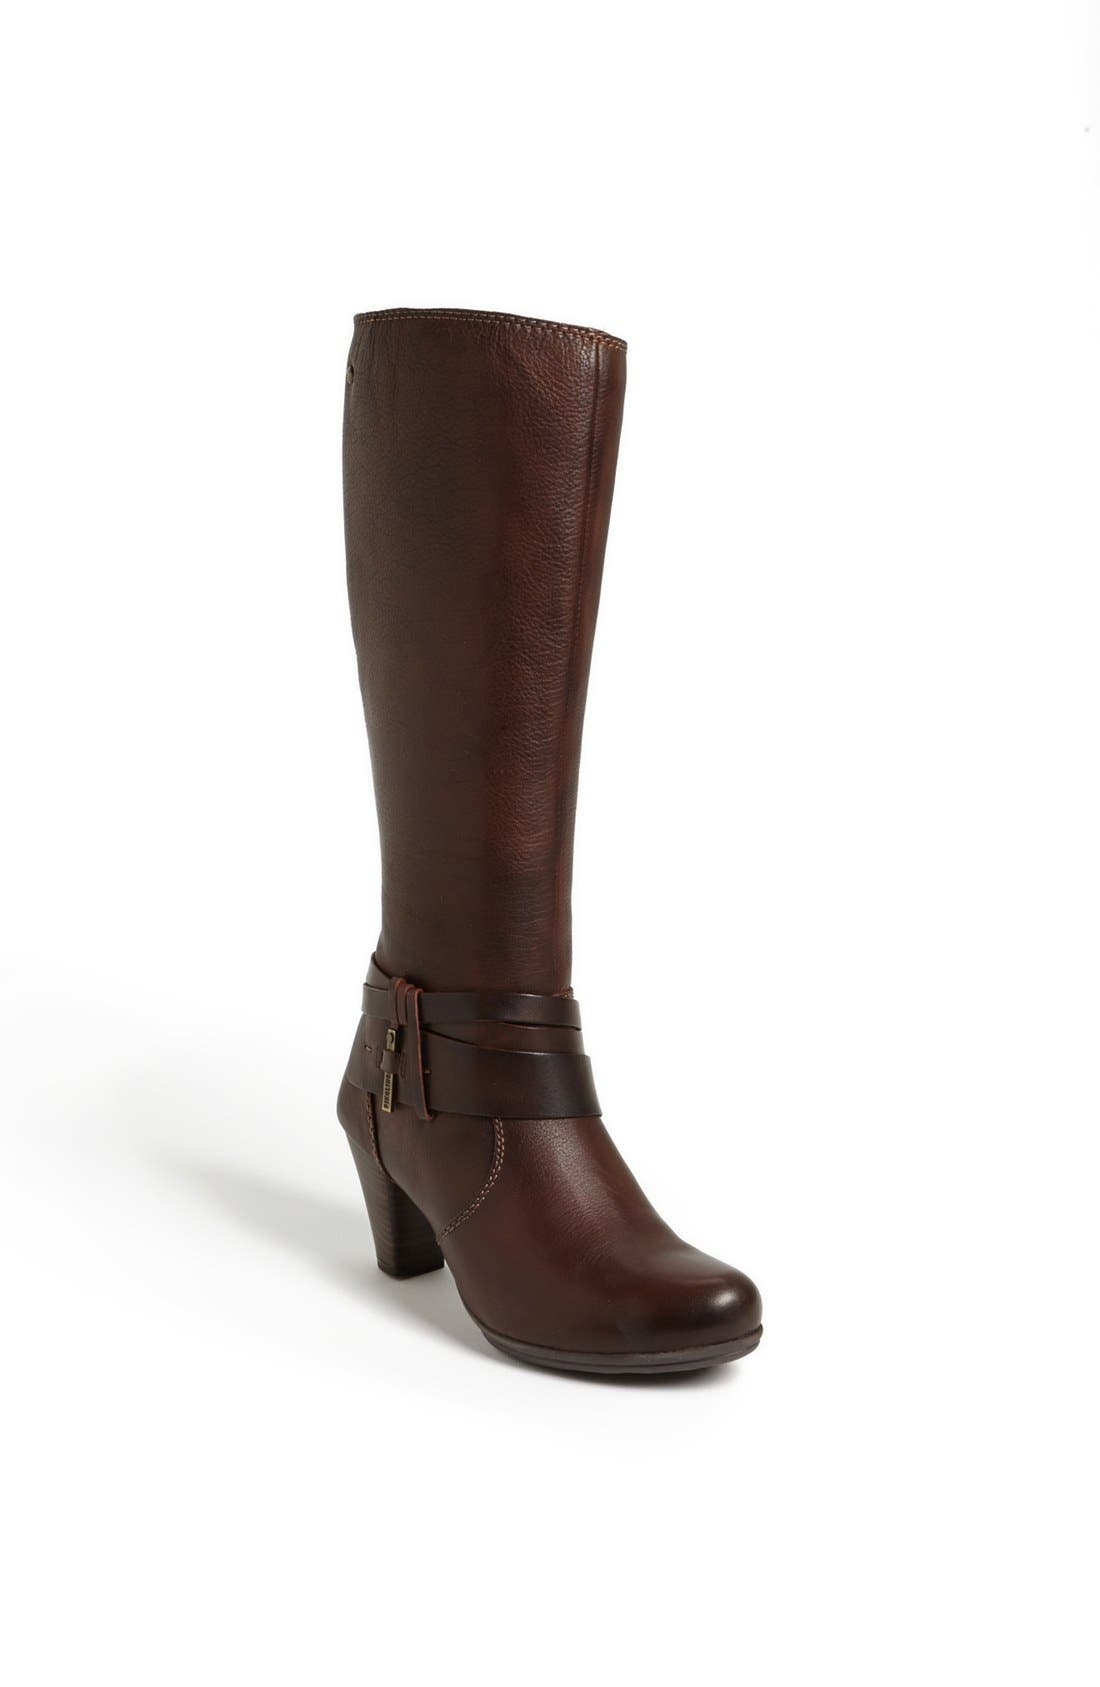 Main Image - PIKOLINOS 'Verona' Boot